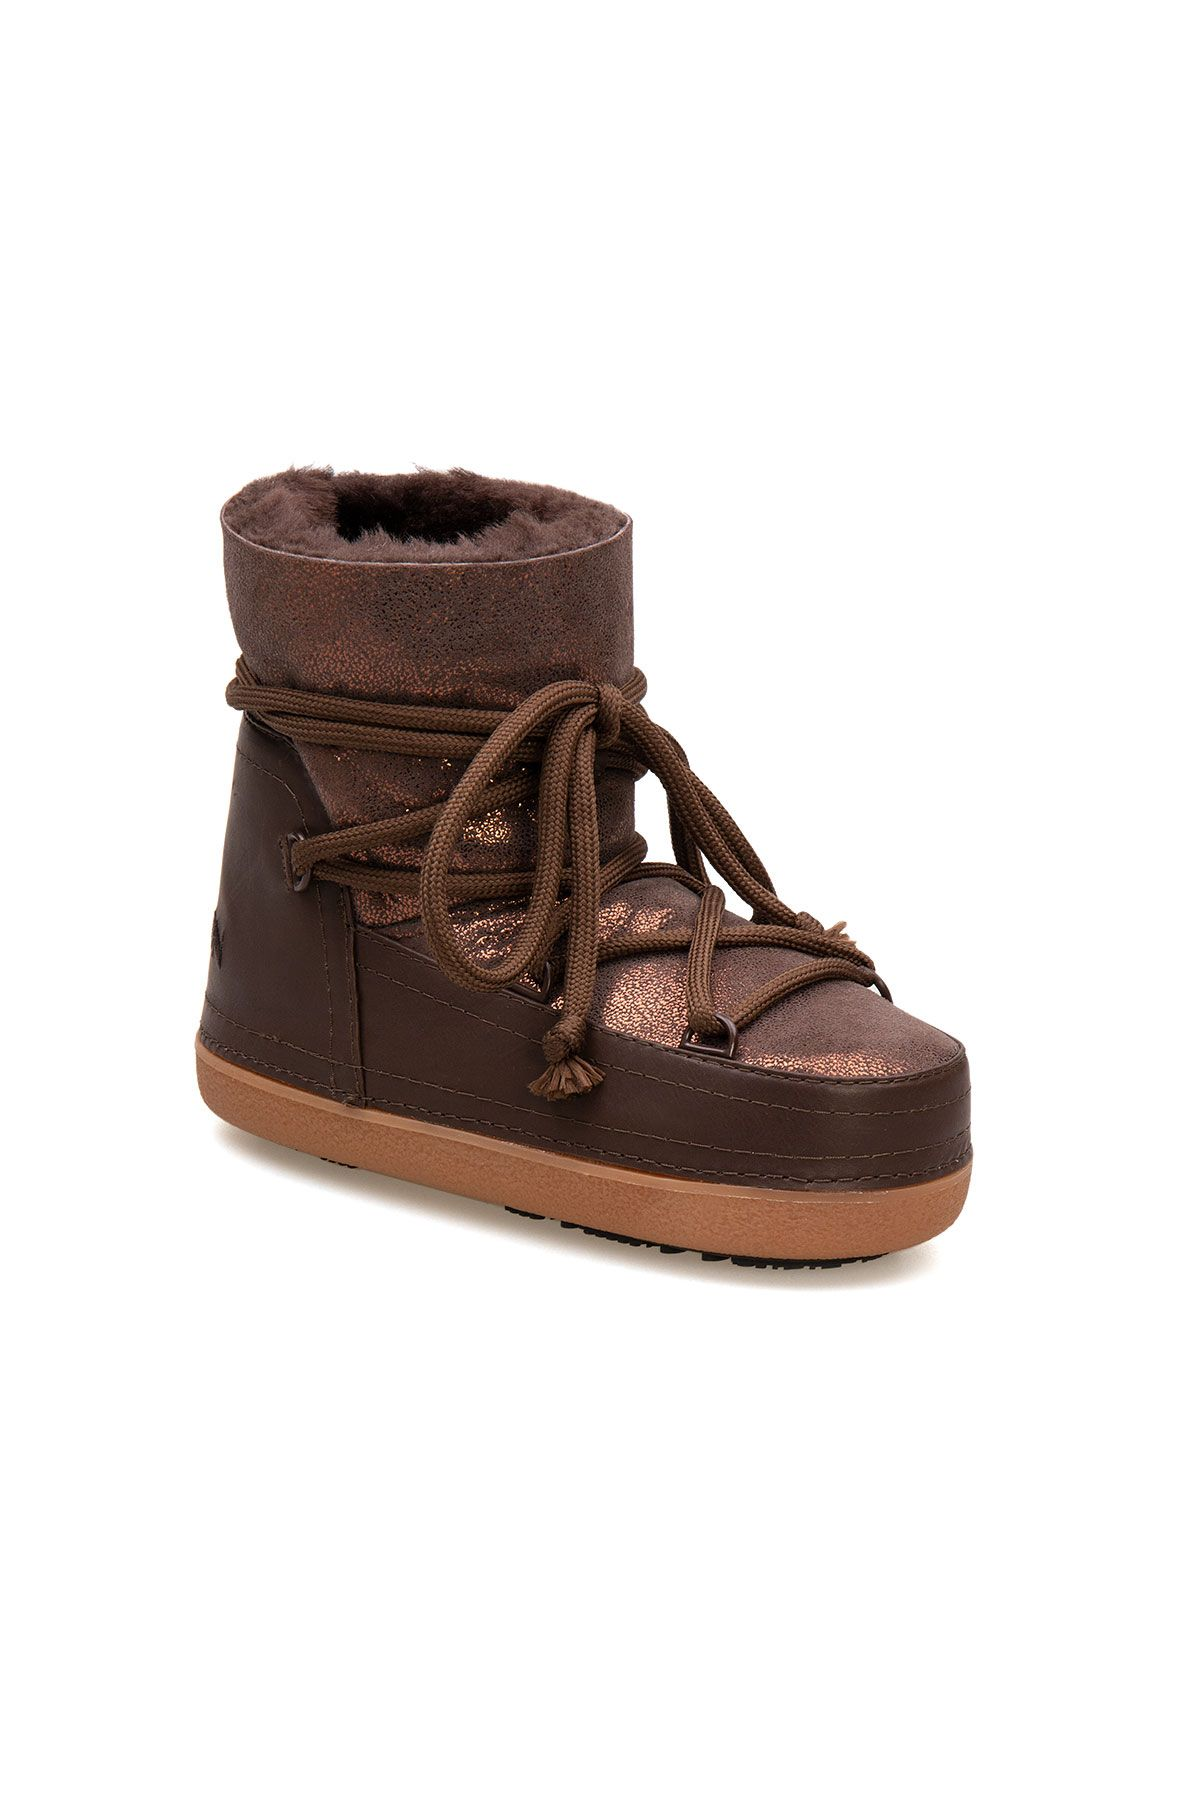 Cool Moon Genuine Sheepskin Women's Snow Boots 251308 Brown